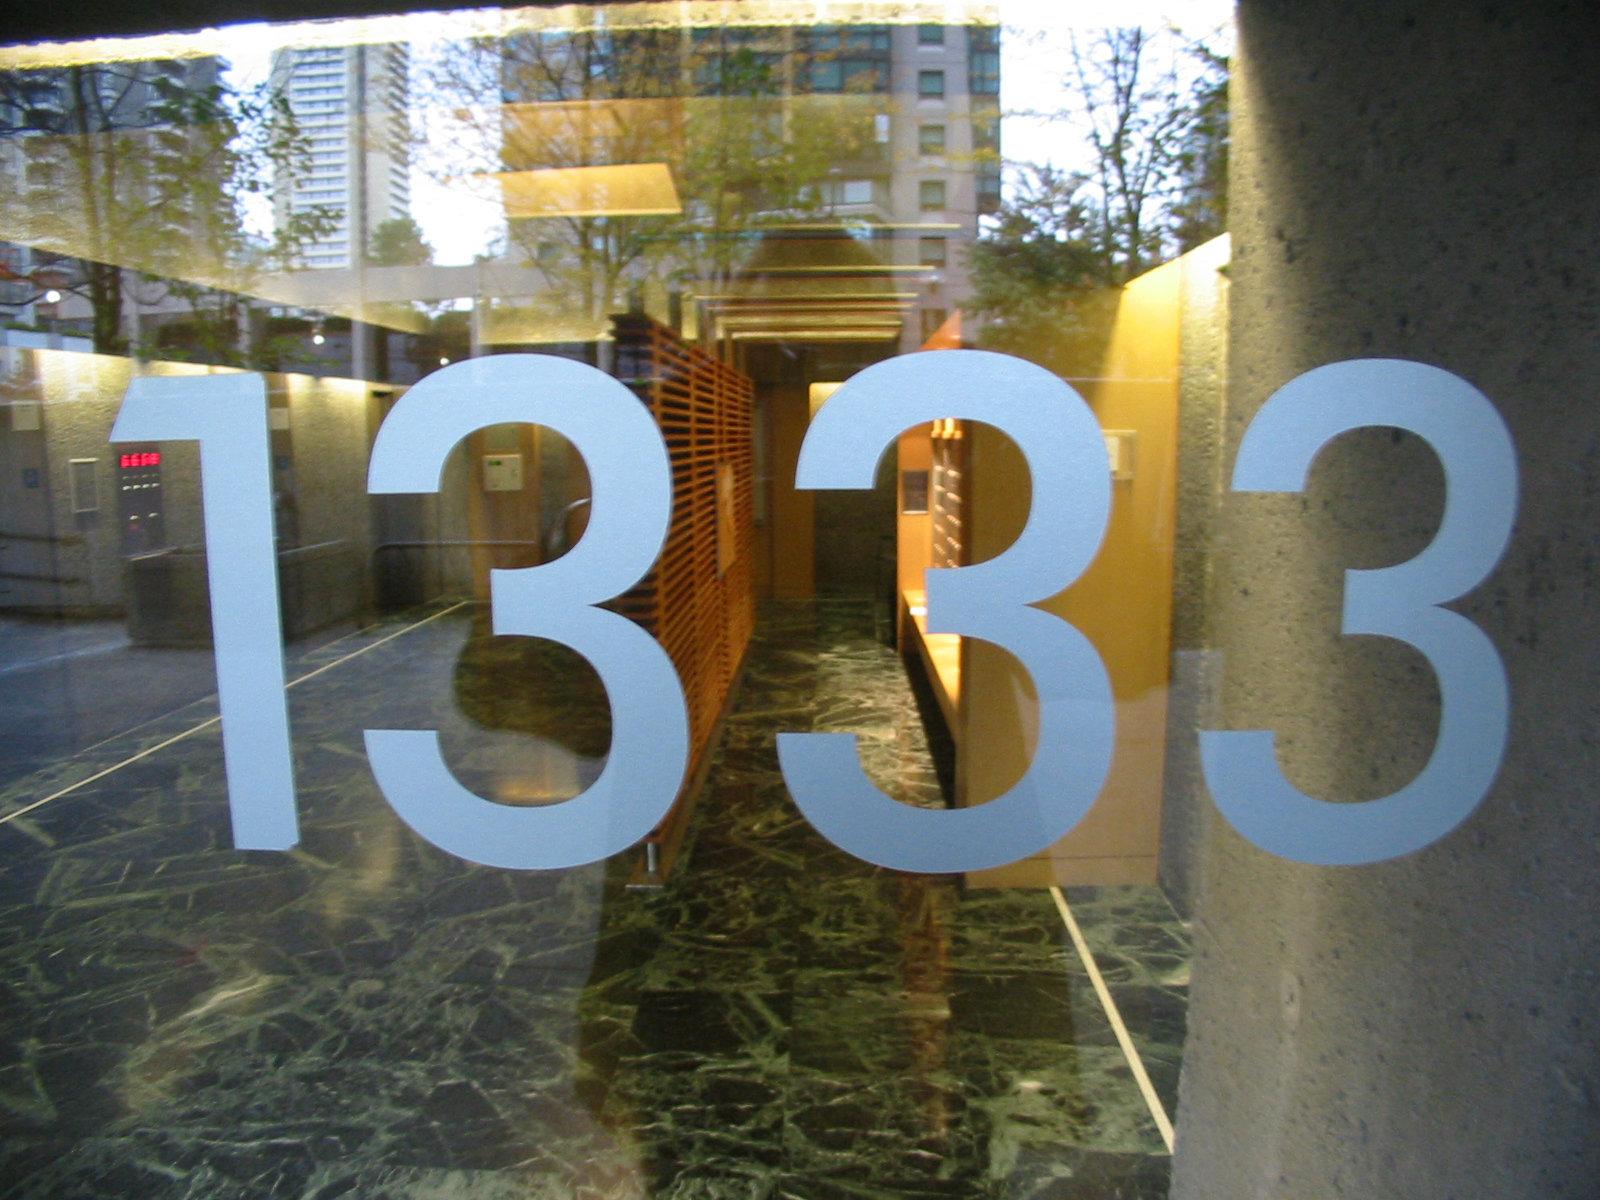 Qube 1333 W. Georgia!